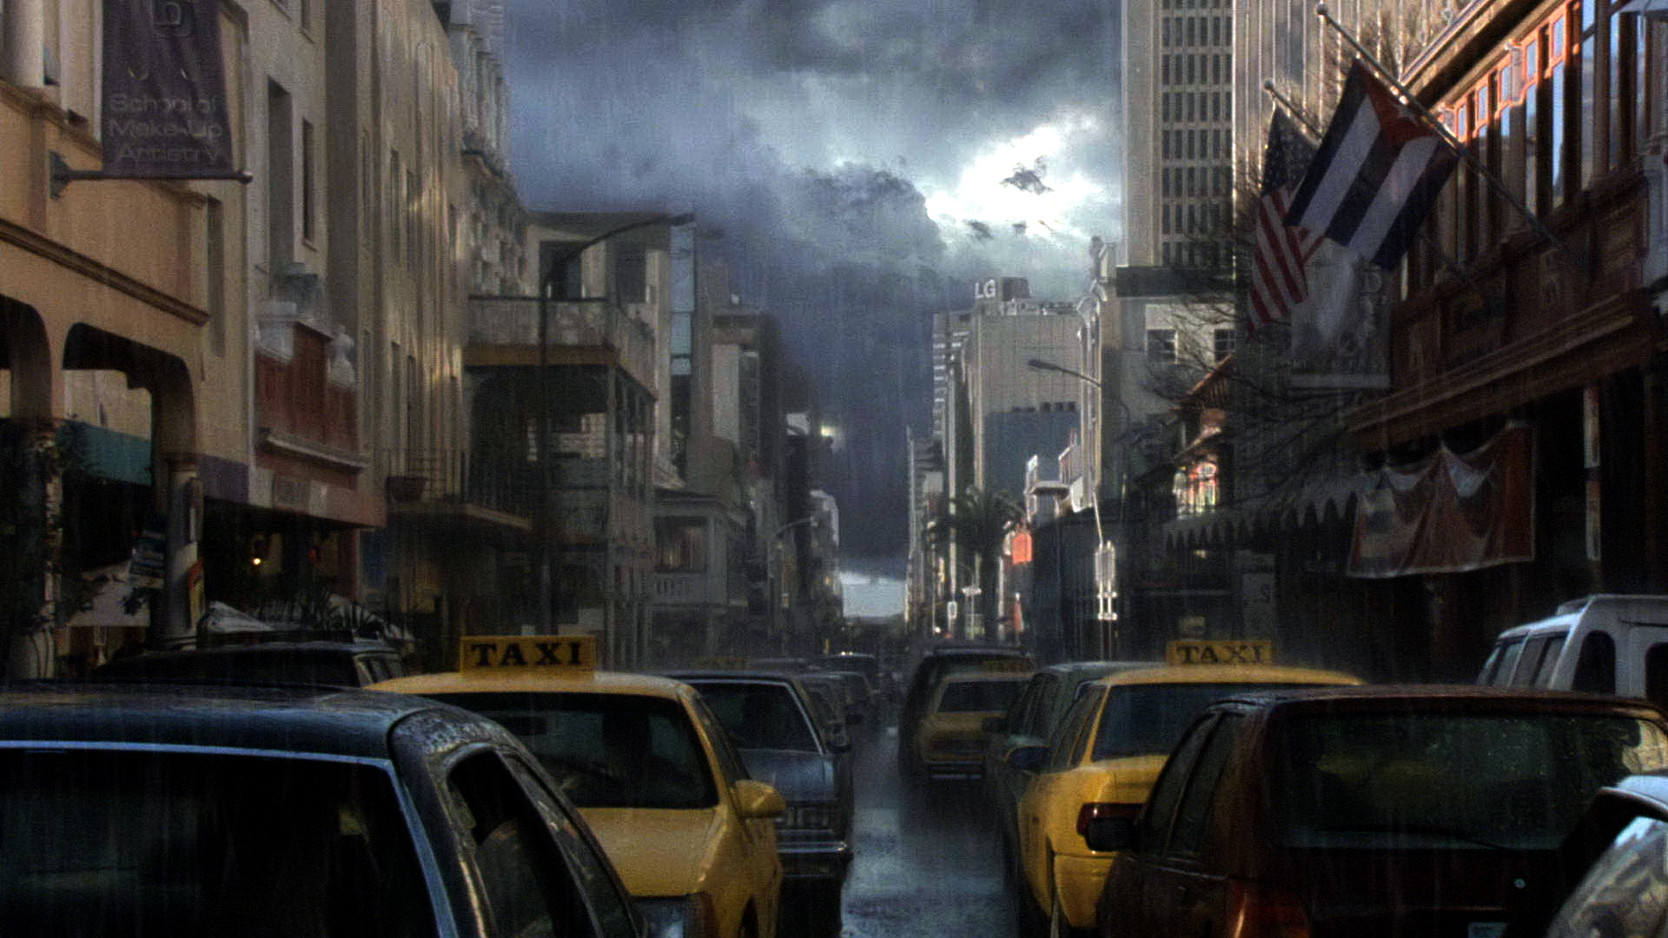 The rift creates a massive storm